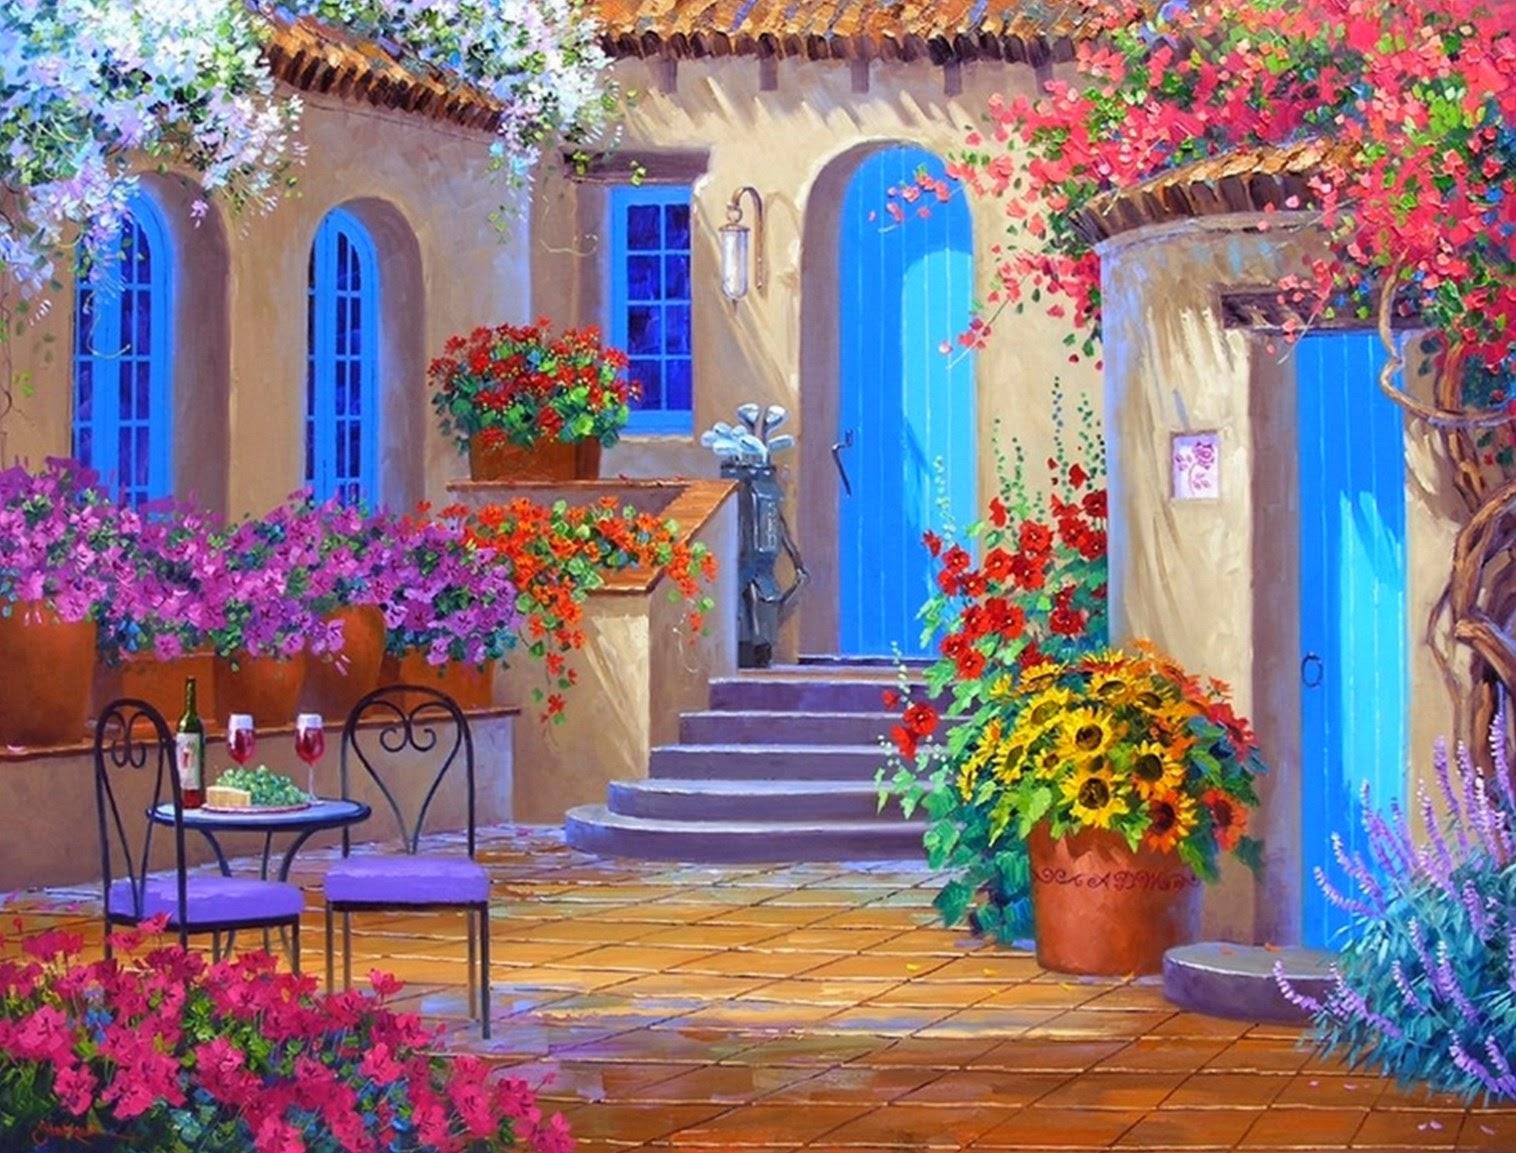 Pintura Moderna Y Fotografia Artistica Flores Cuadros Oleo Serie